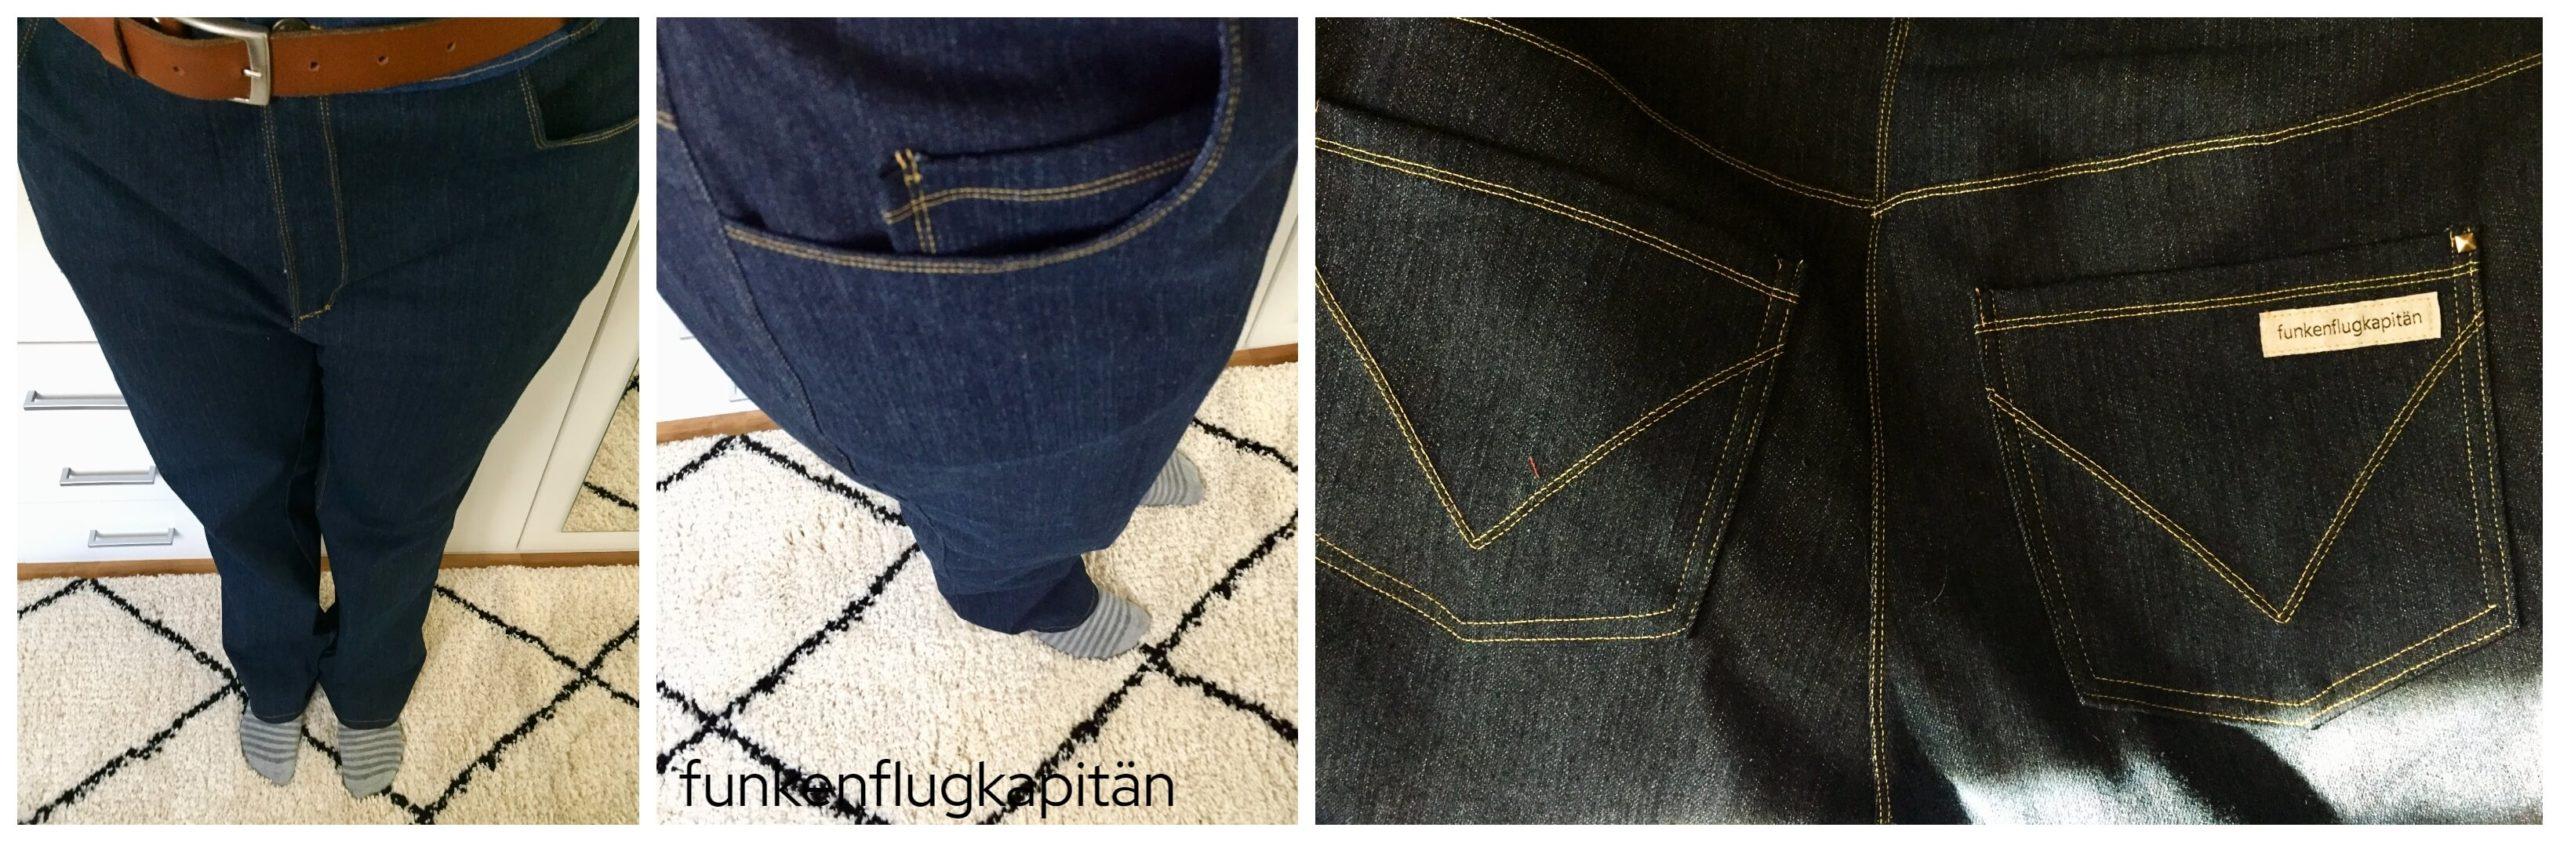 Hilli Hildrud Jeans